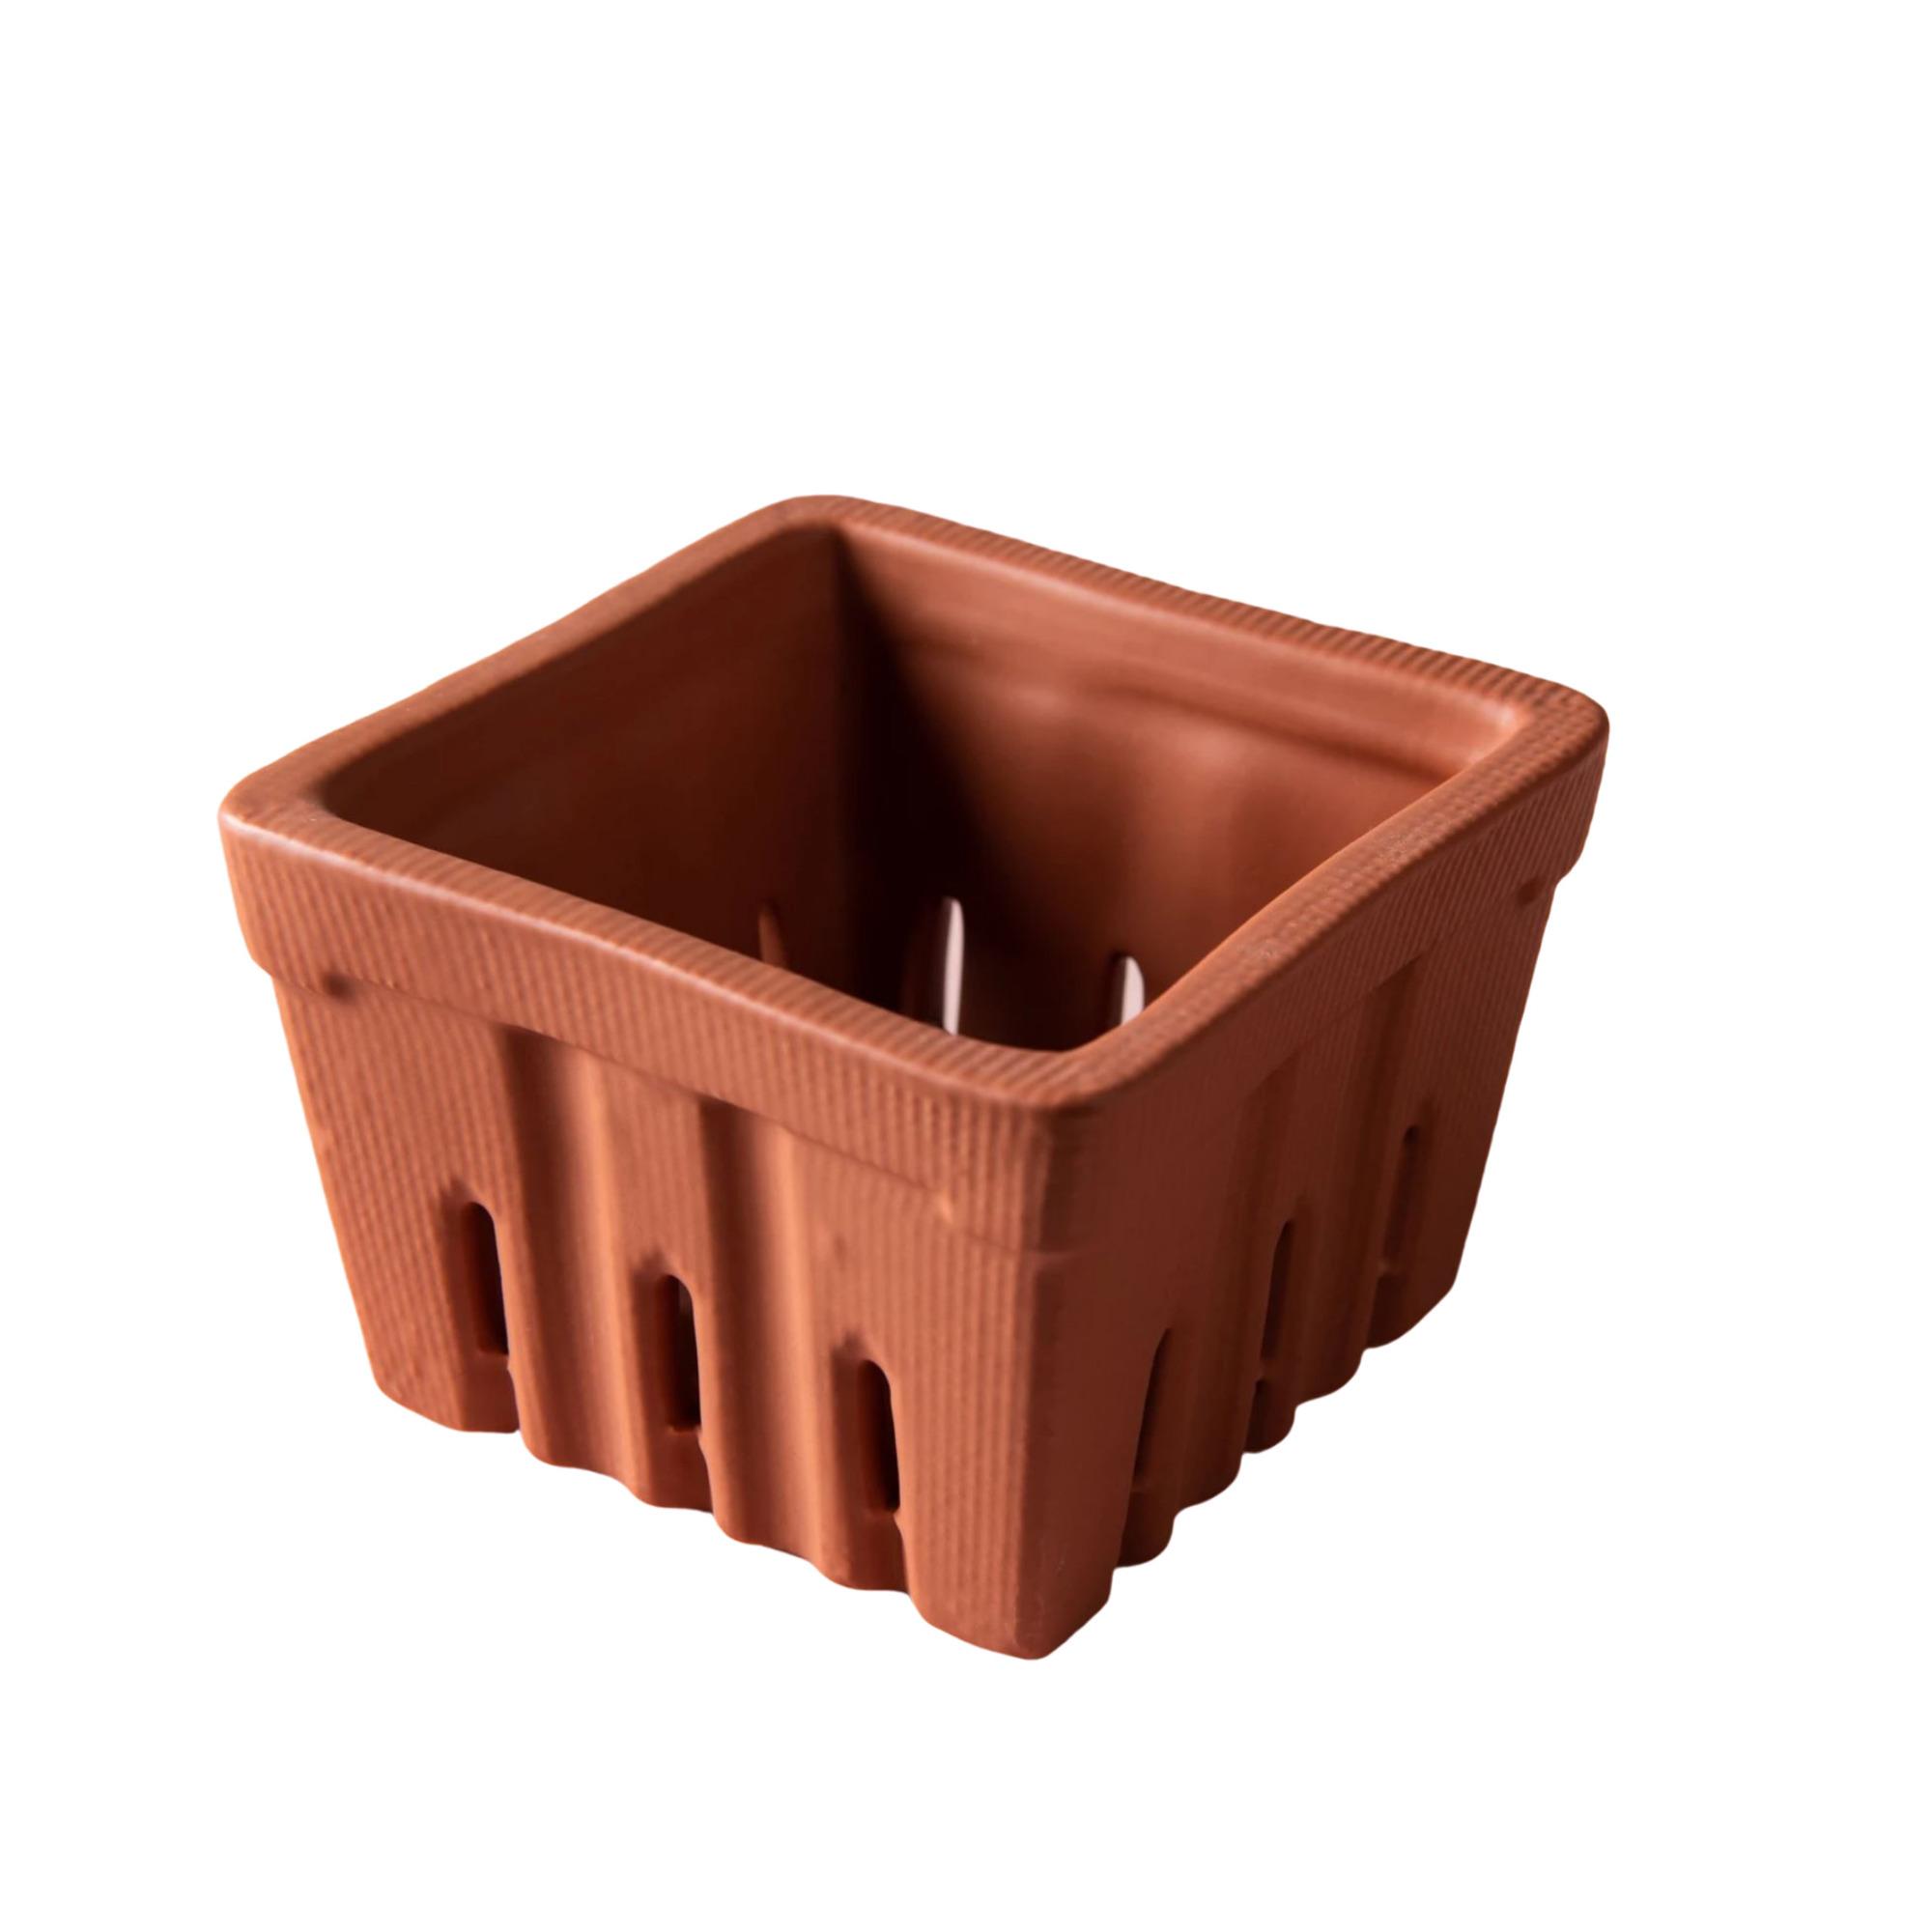 Terracotta Berry Basket